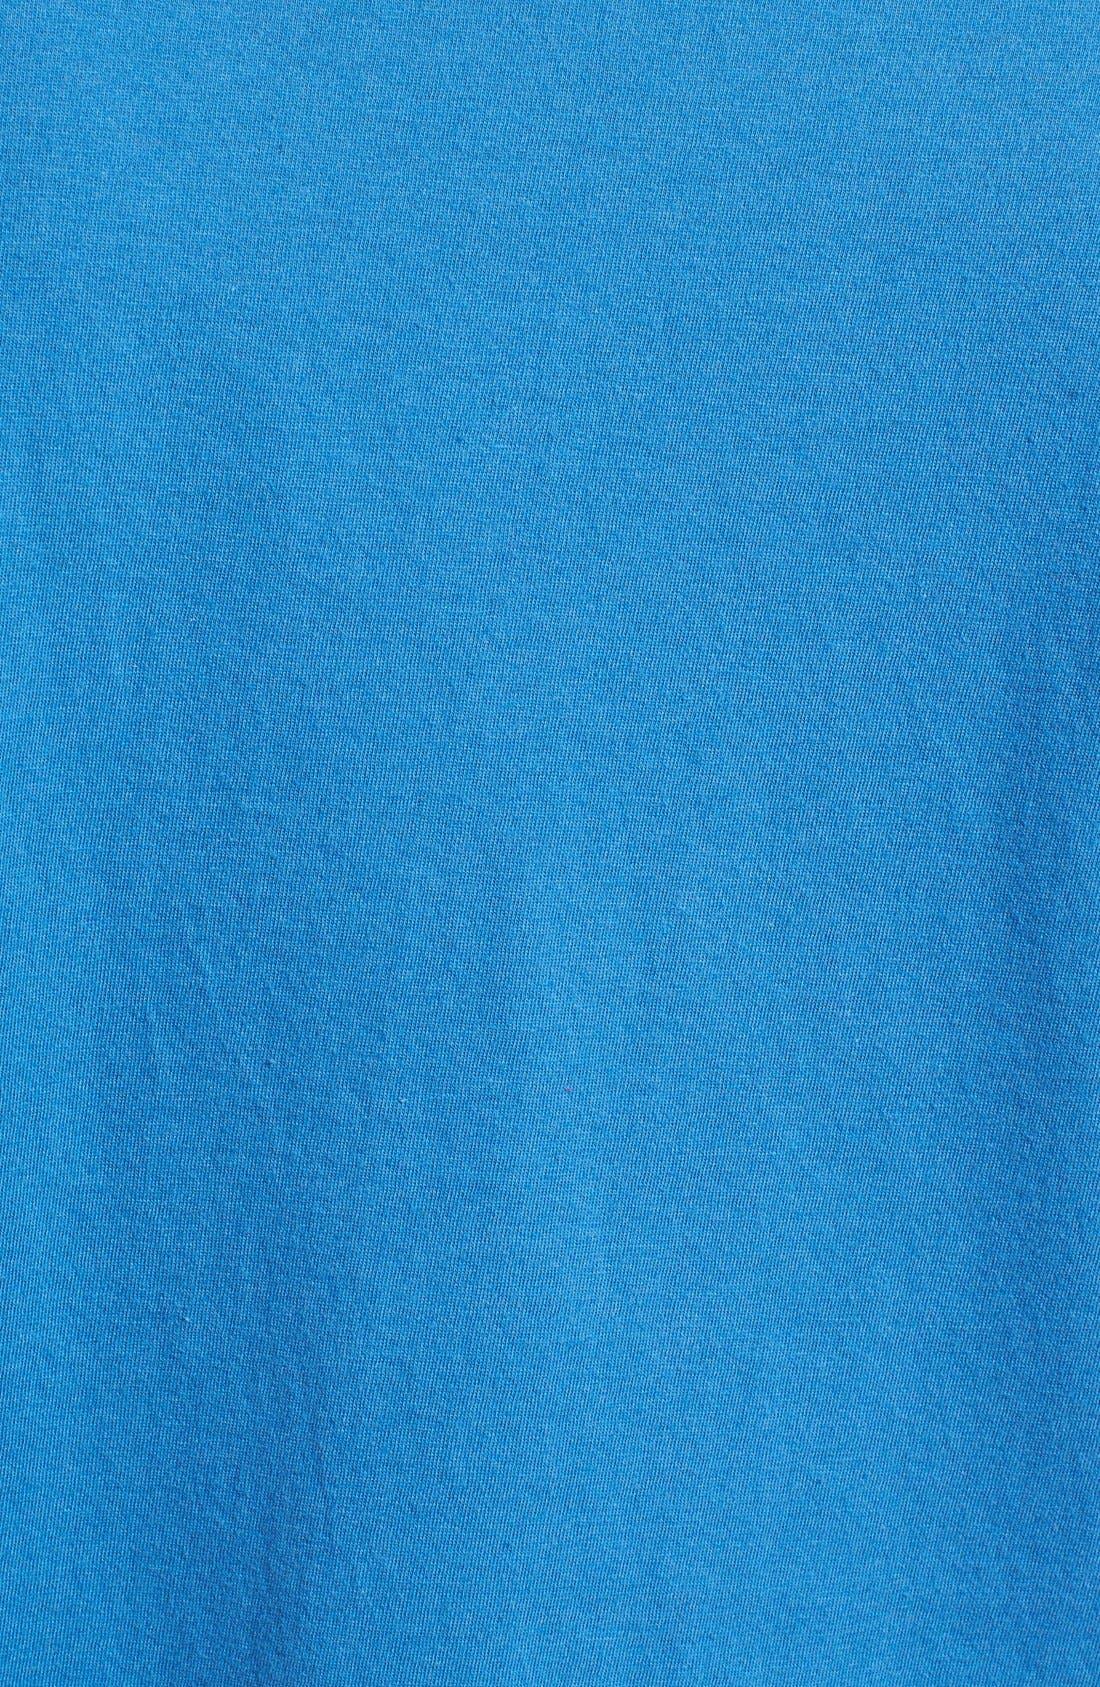 'Chicago Cubs - Brass Tacks' Trim Fit T-Shirt,                             Alternate thumbnail 5, color,                             450